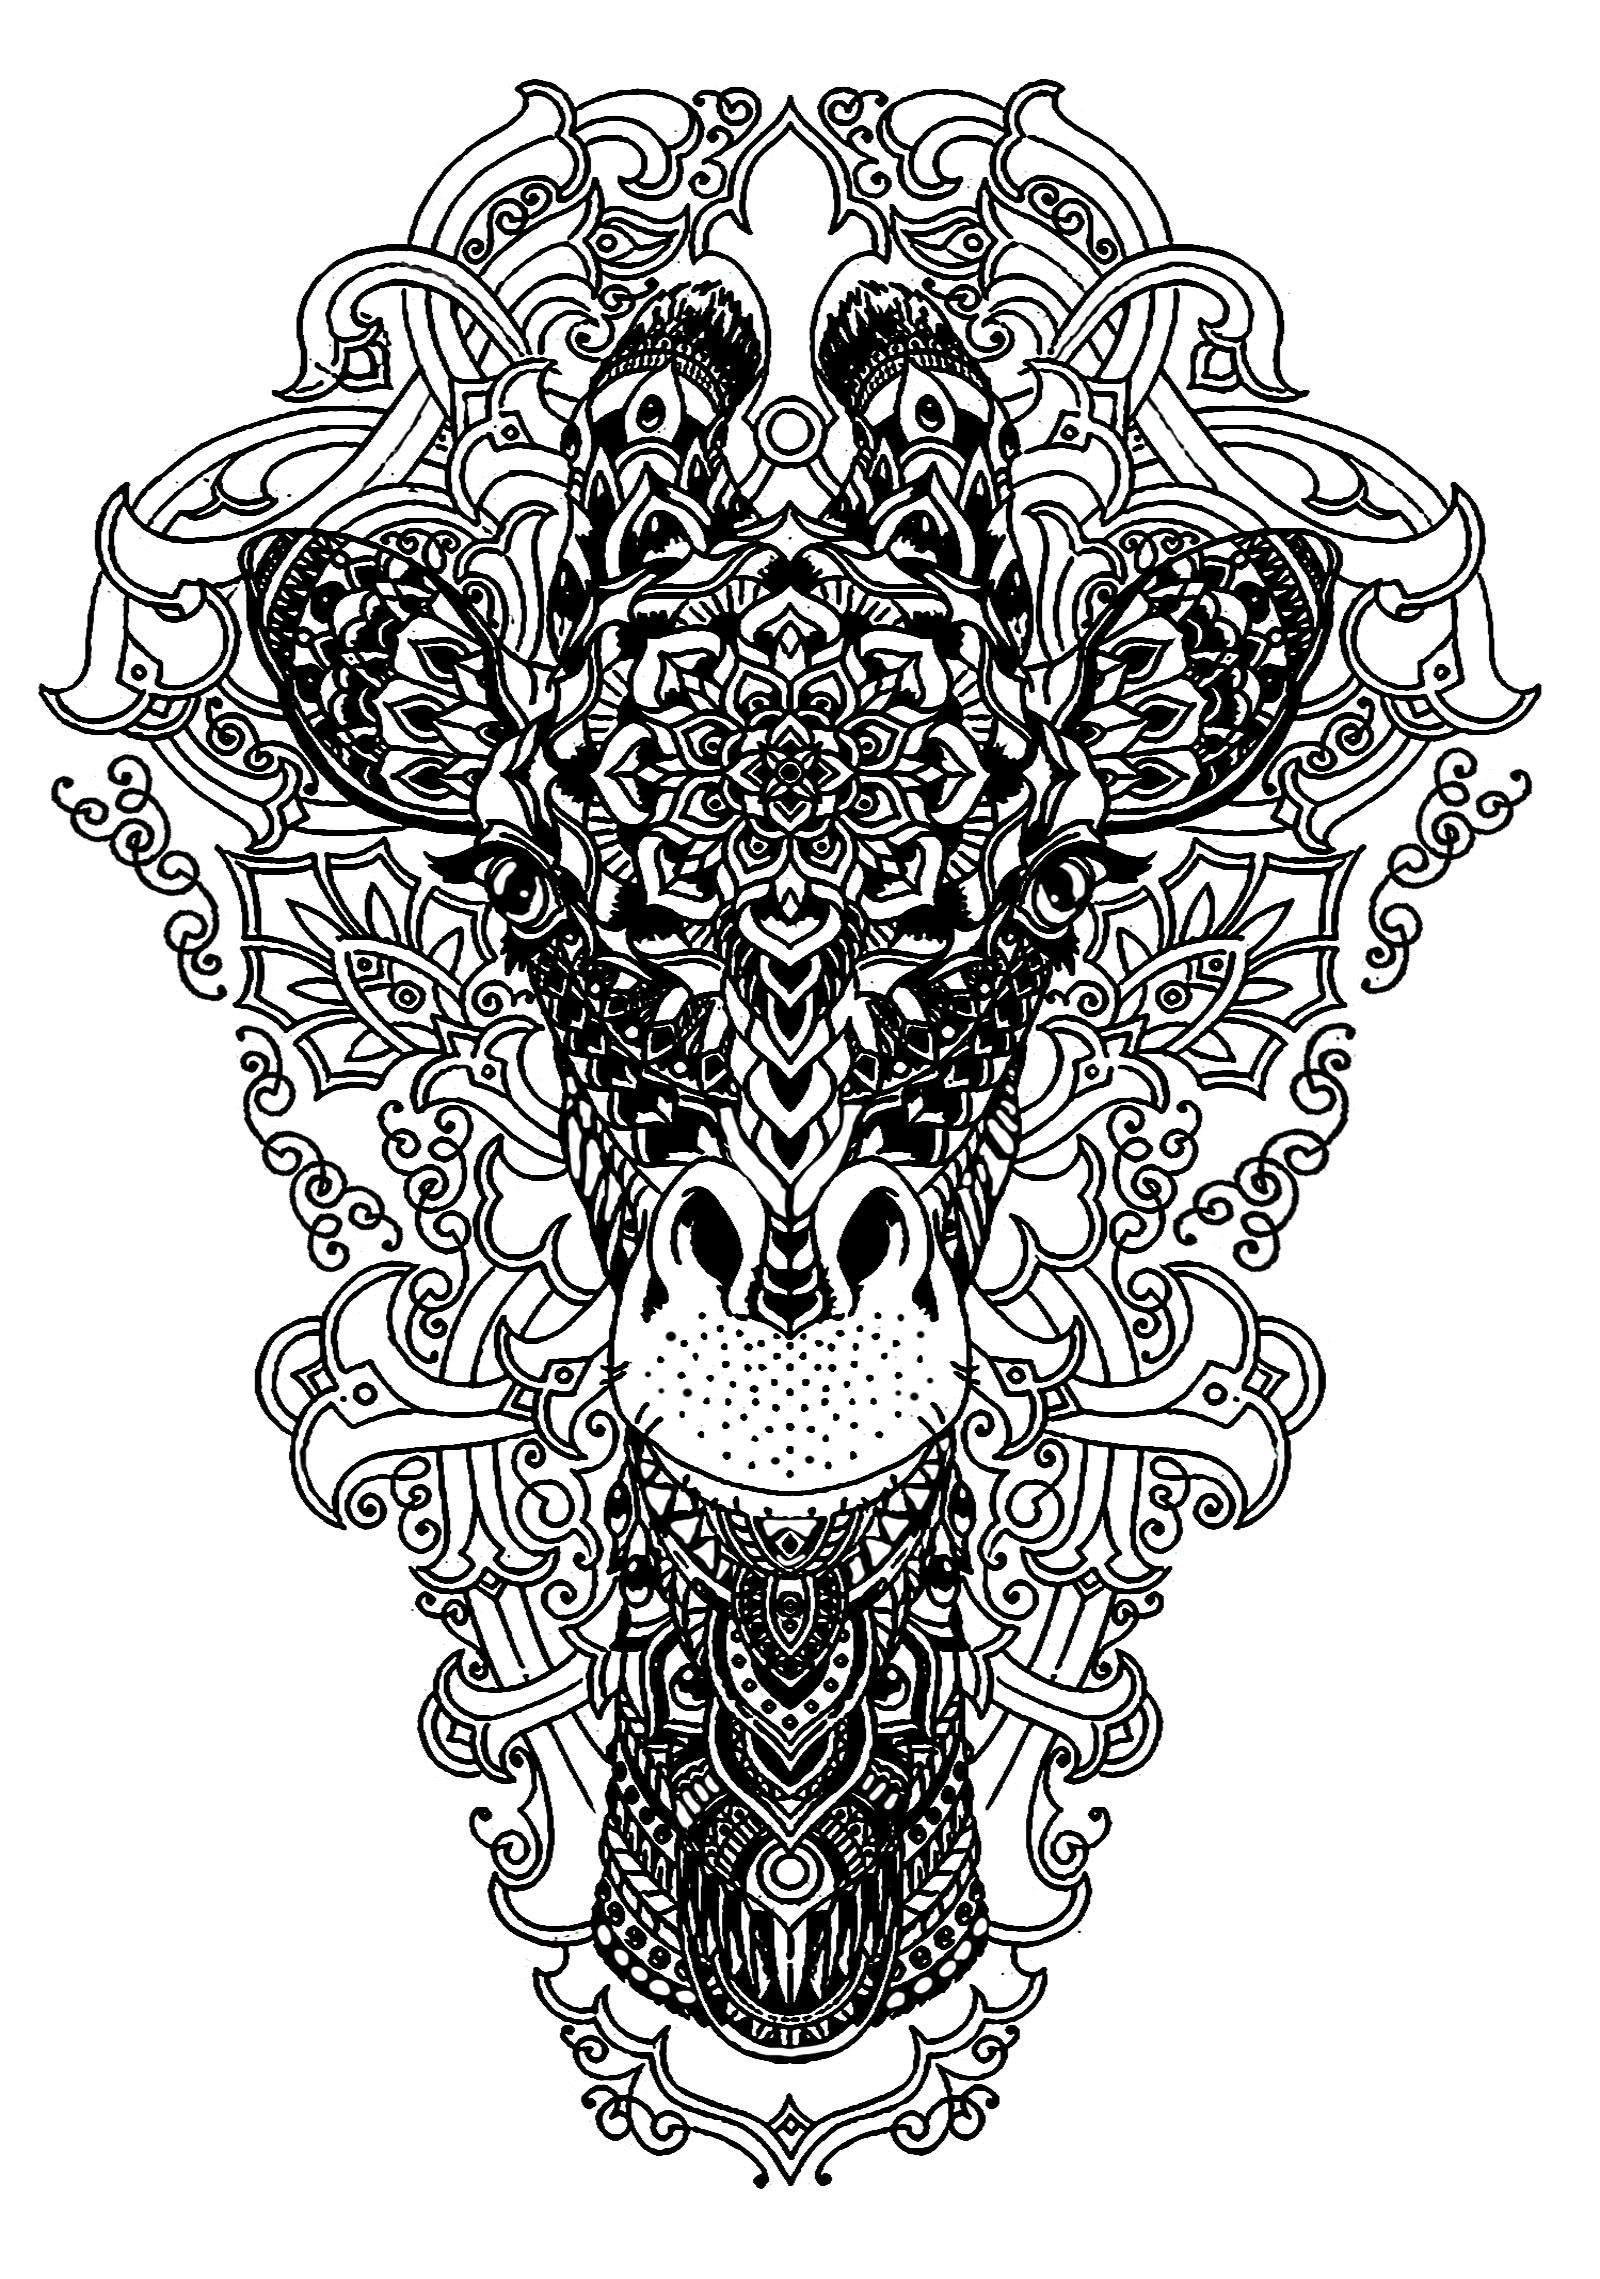 Tete de girafe girafes coloriages difficiles pour adultes for Giraffe mandala coloring pages